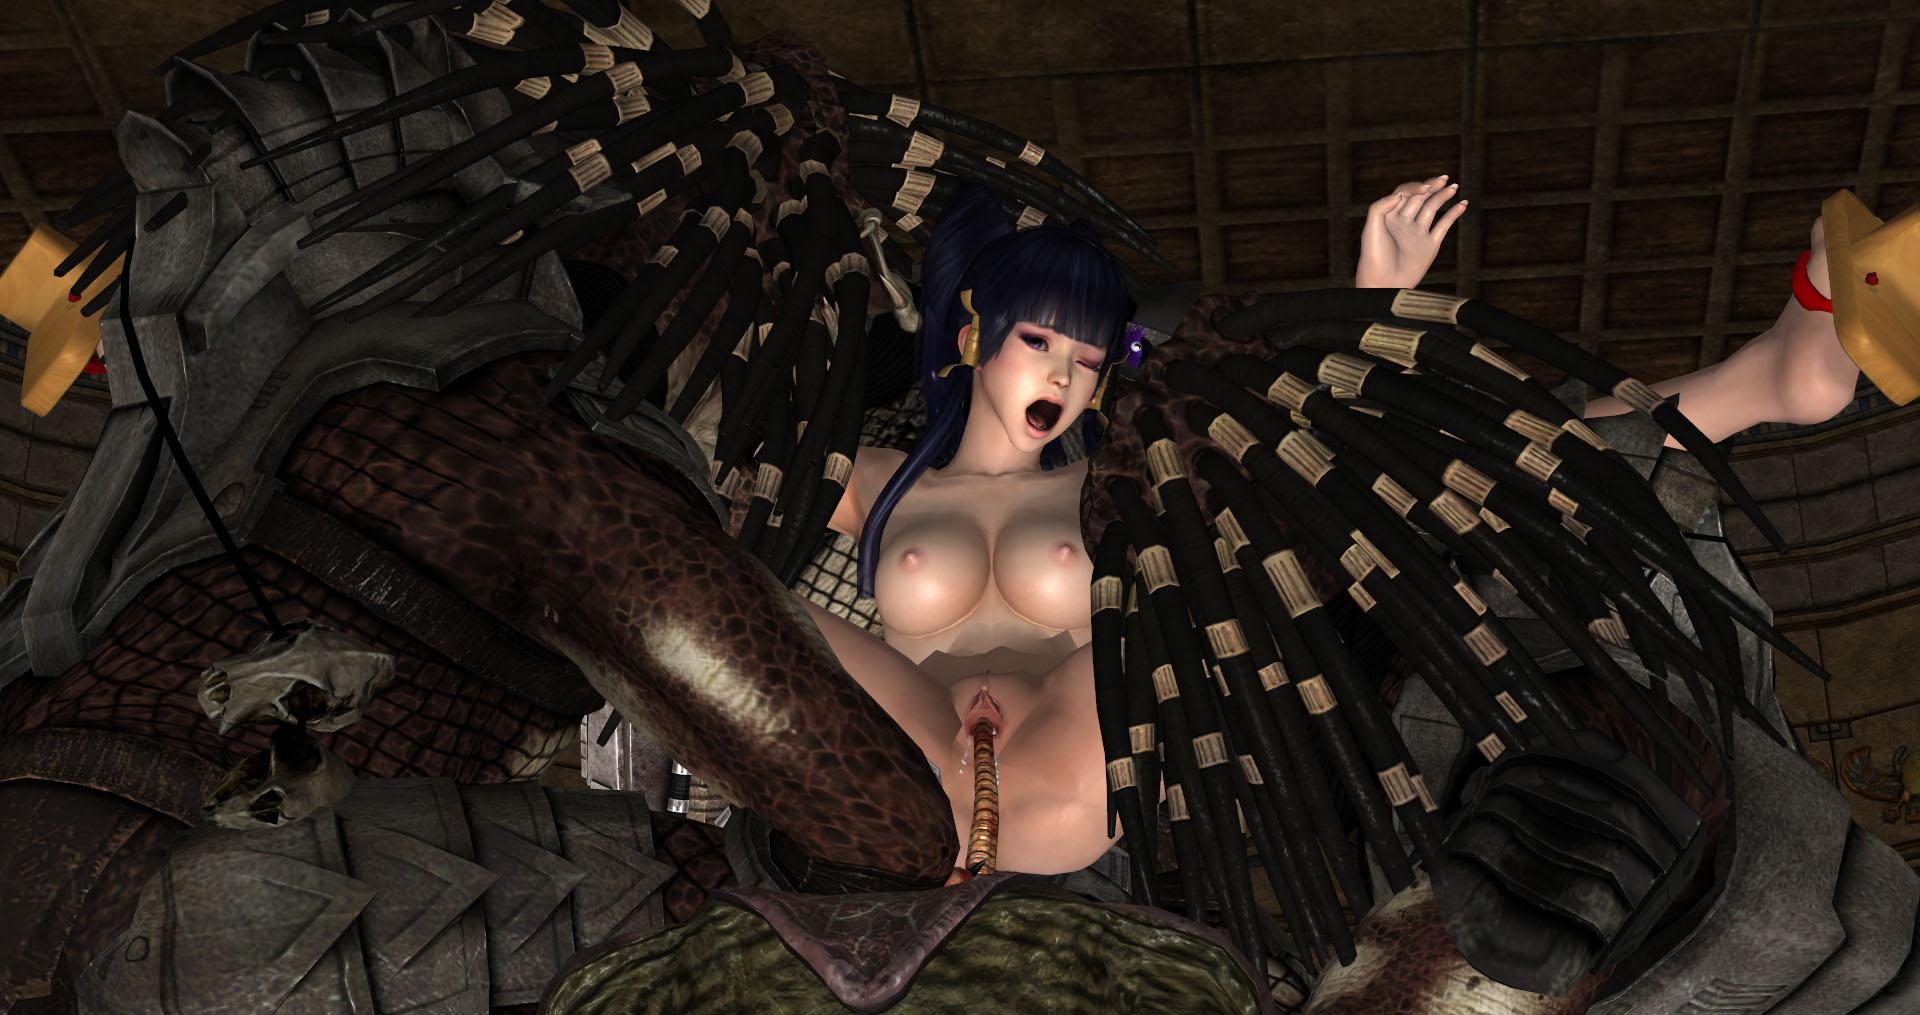 nyotengu_sacrifice_to_pussy_hugger_0008_layer_78_by_bitemonsters-dbgzcn6.jpg